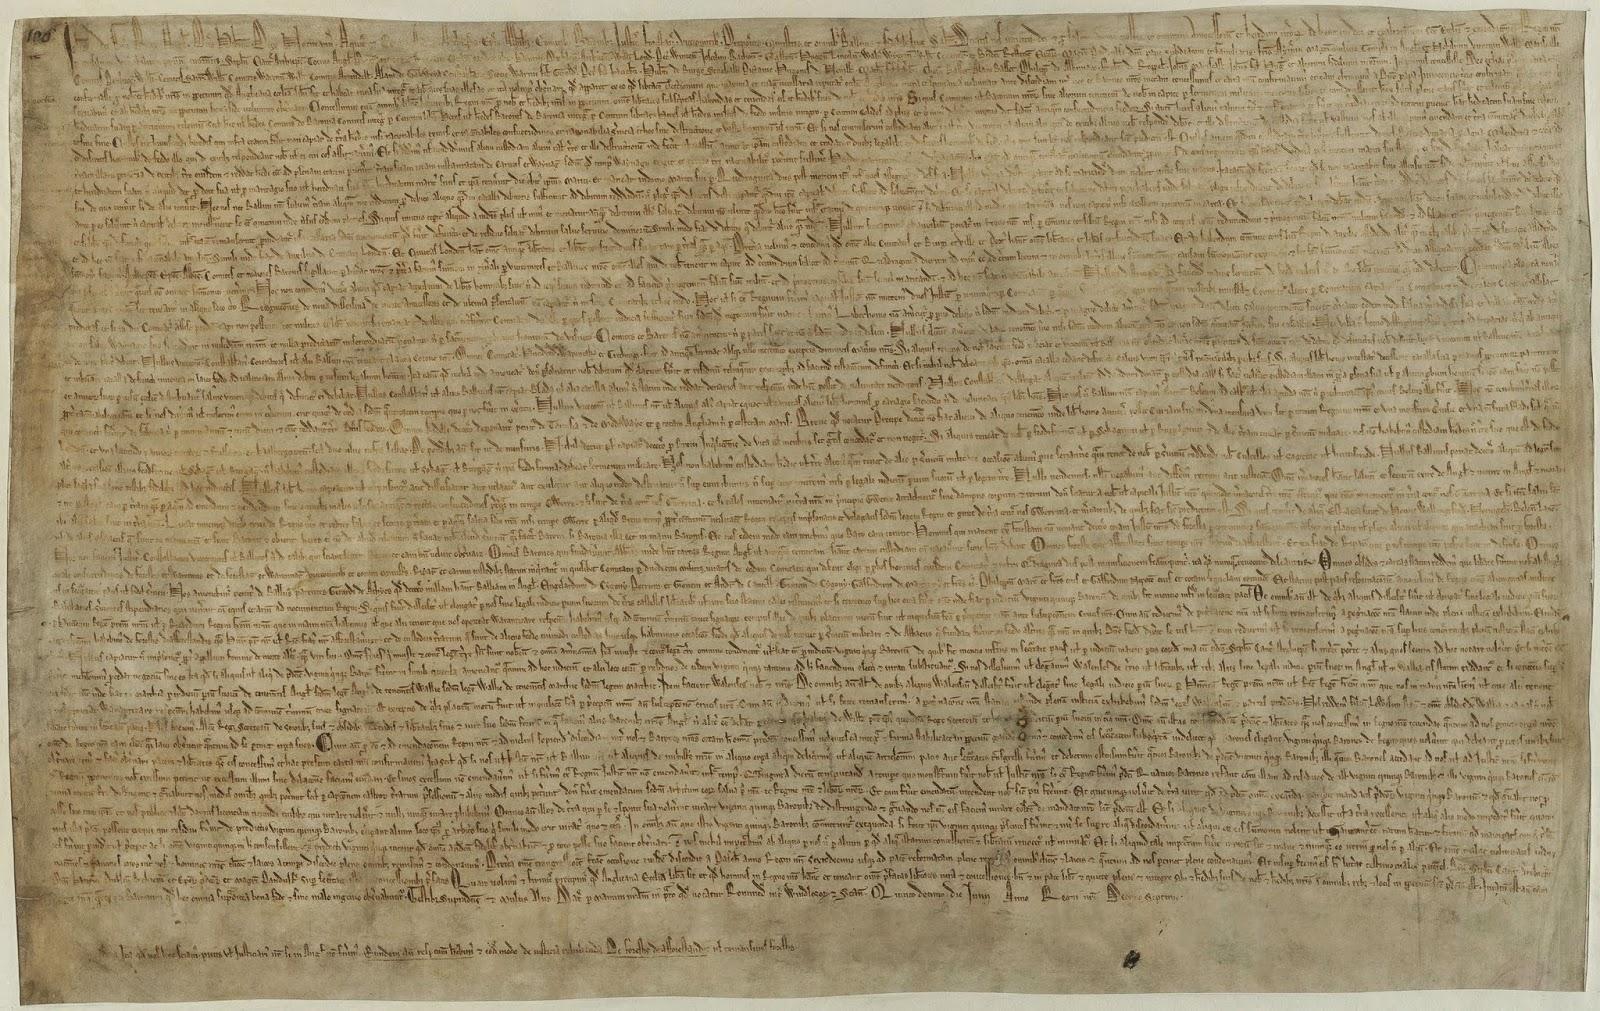 magna carta, british library, old document, law, democracy